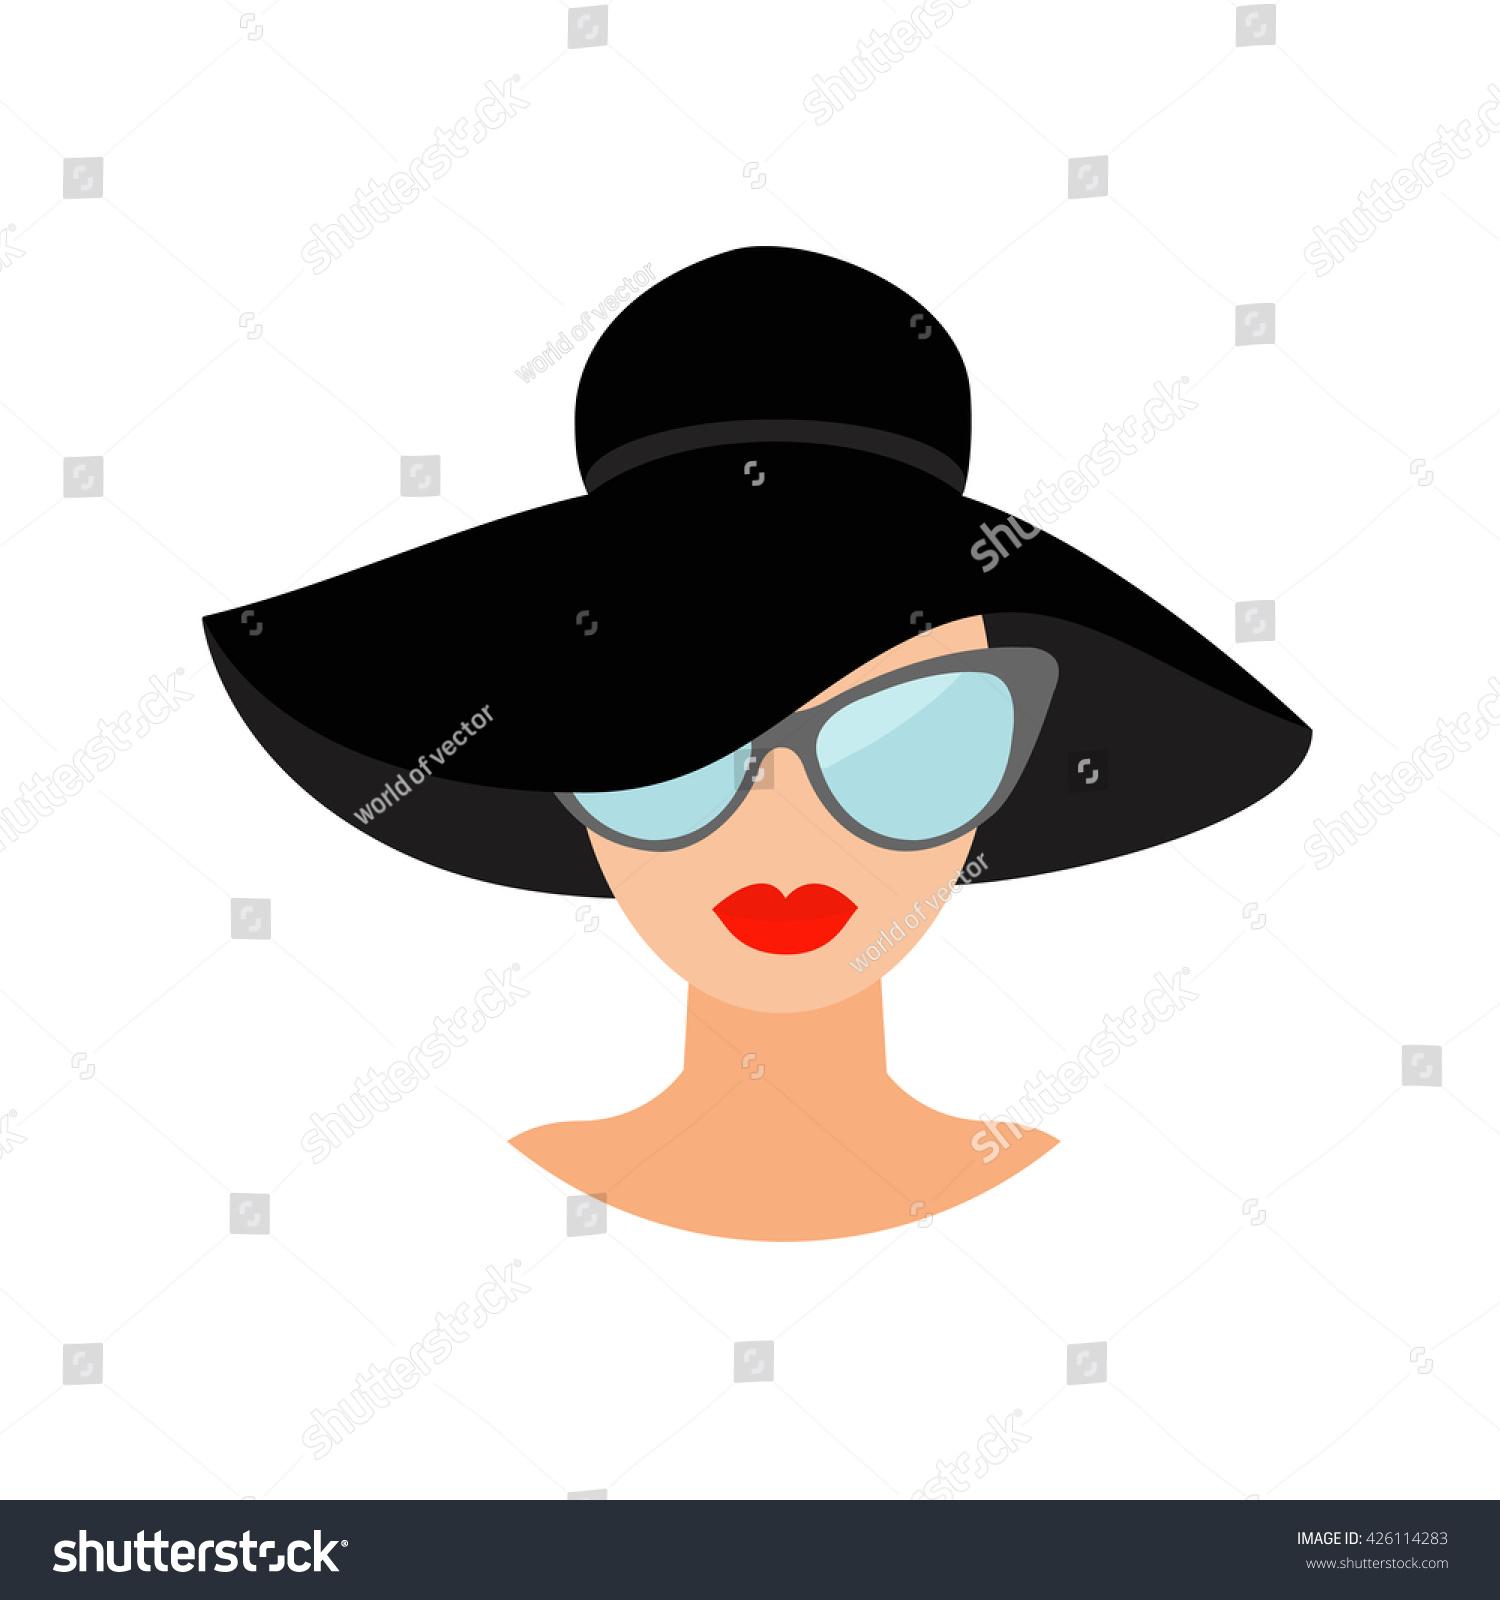 Cartoon Characters W Glasses : Female cartoon characters with glasses imgkid